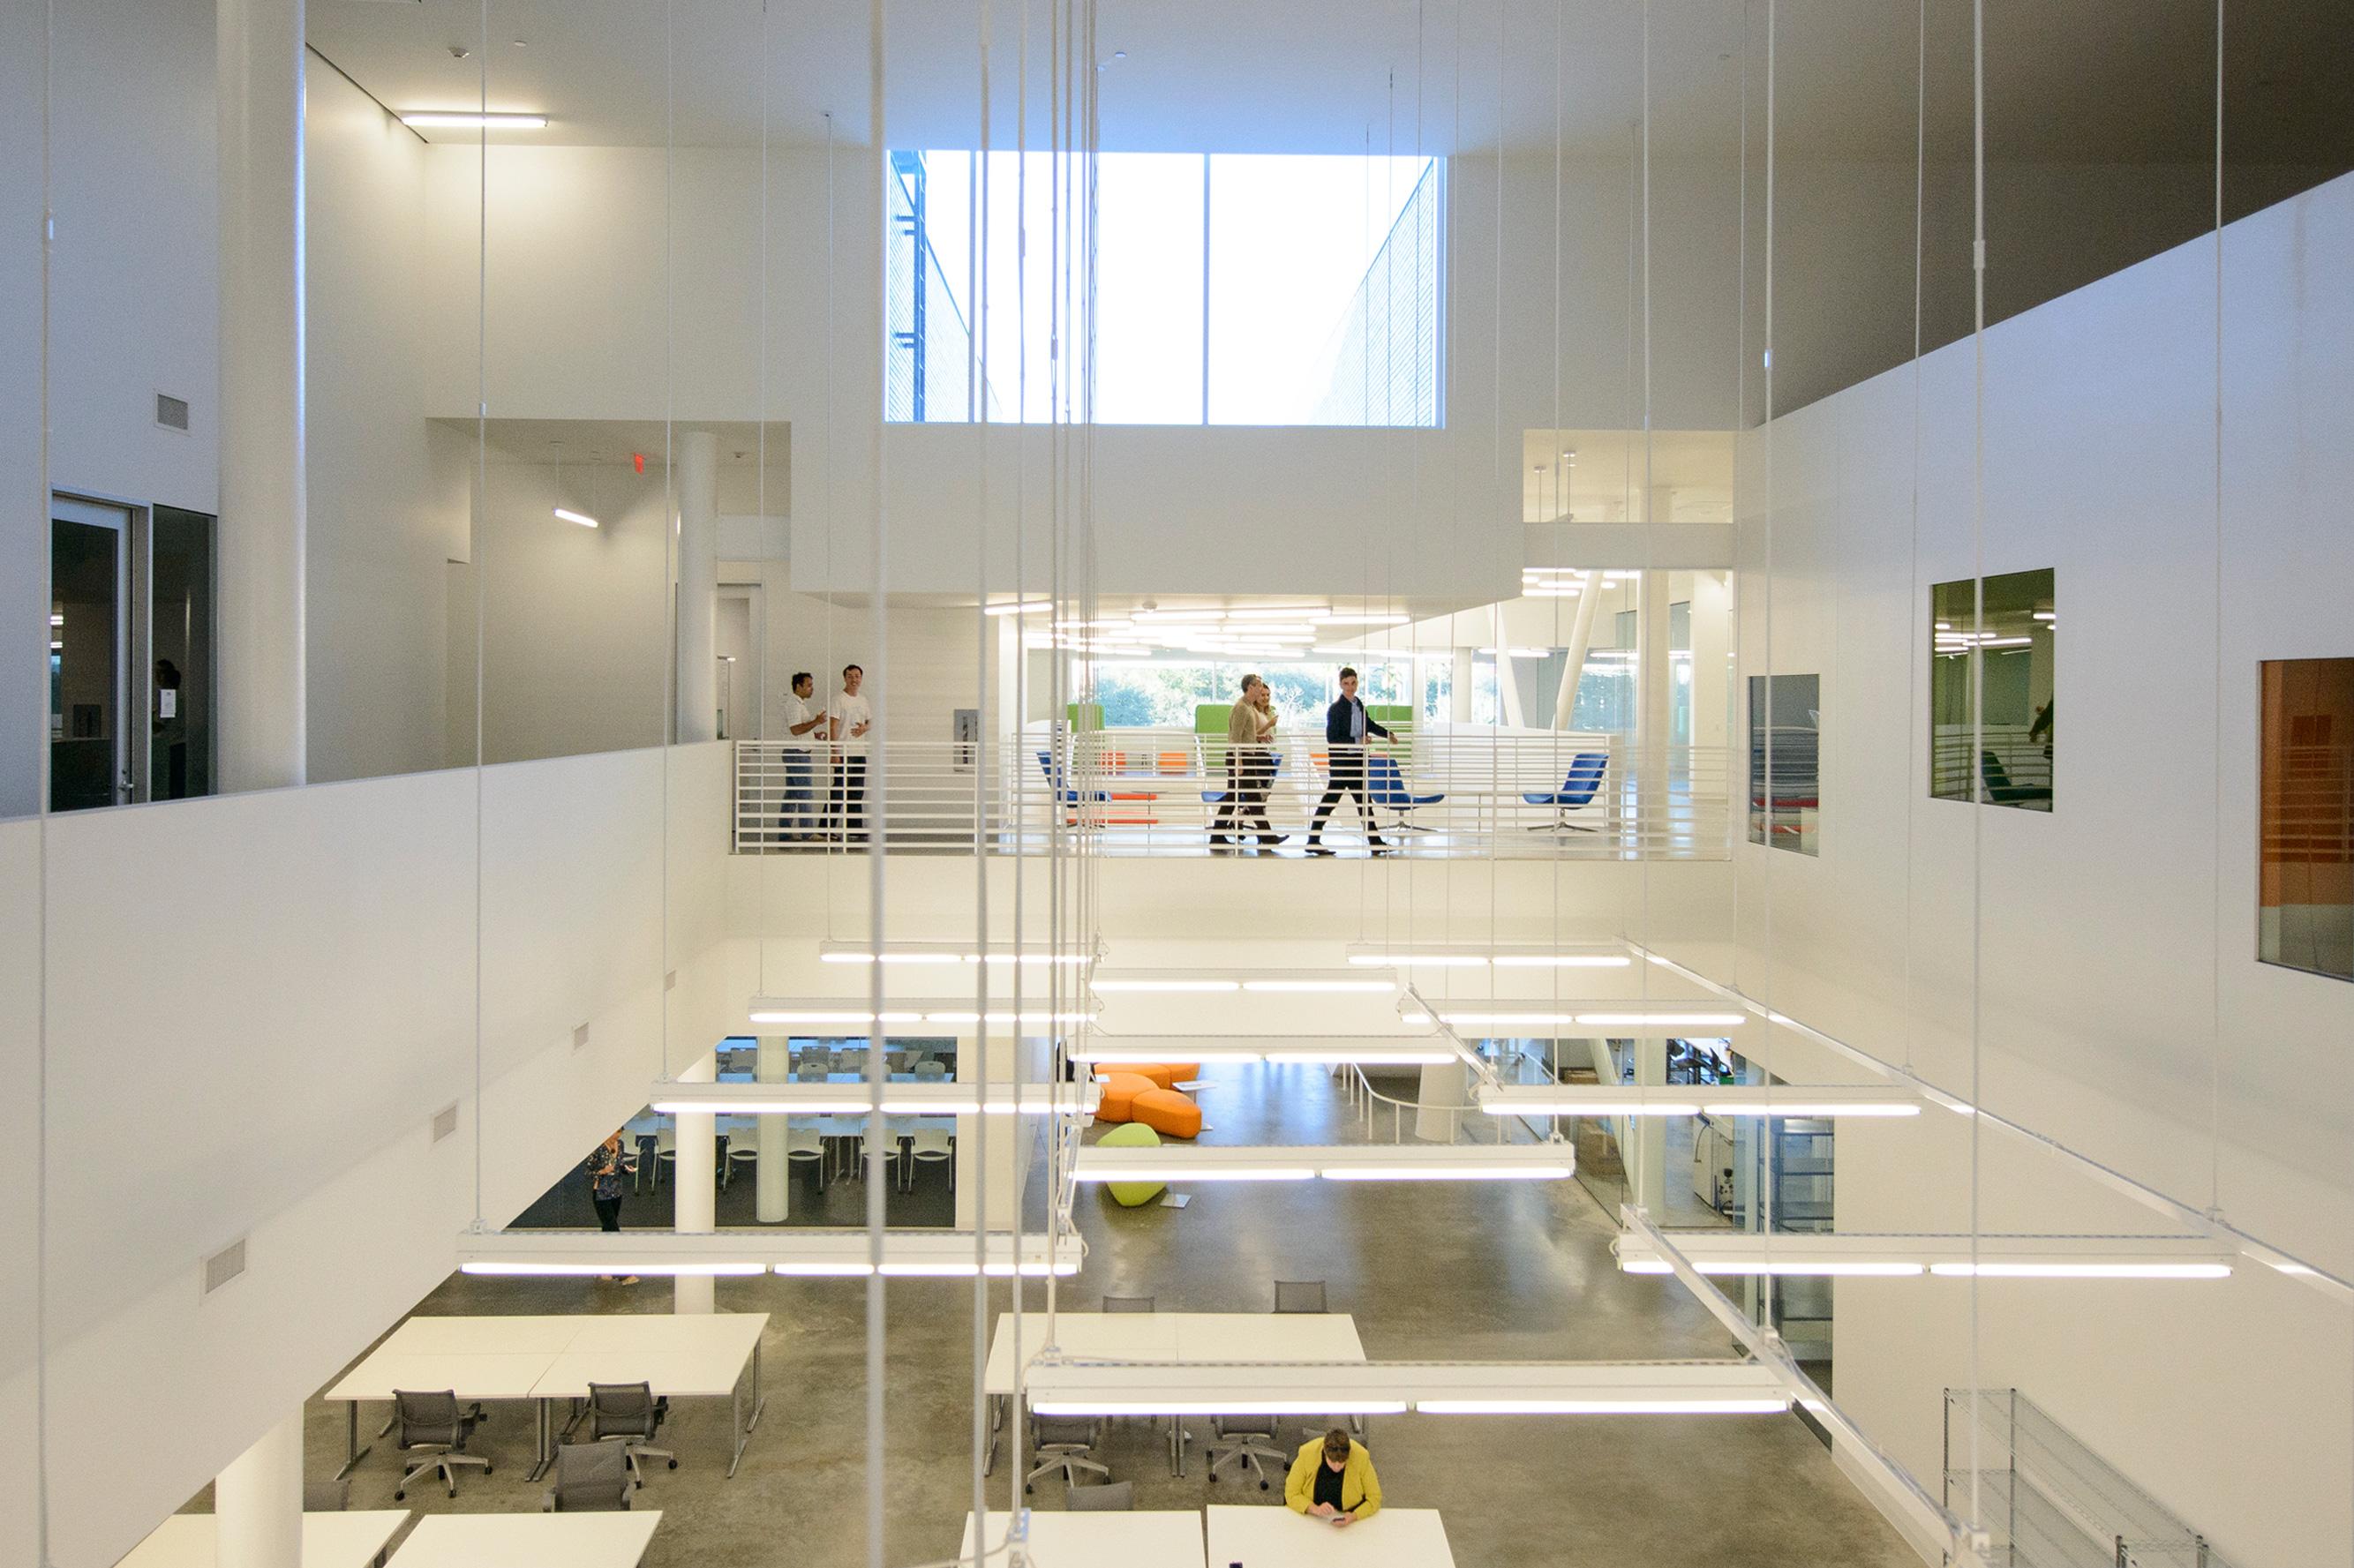 Rice University Moody Center for the Arts Michael Maltzan Architecture